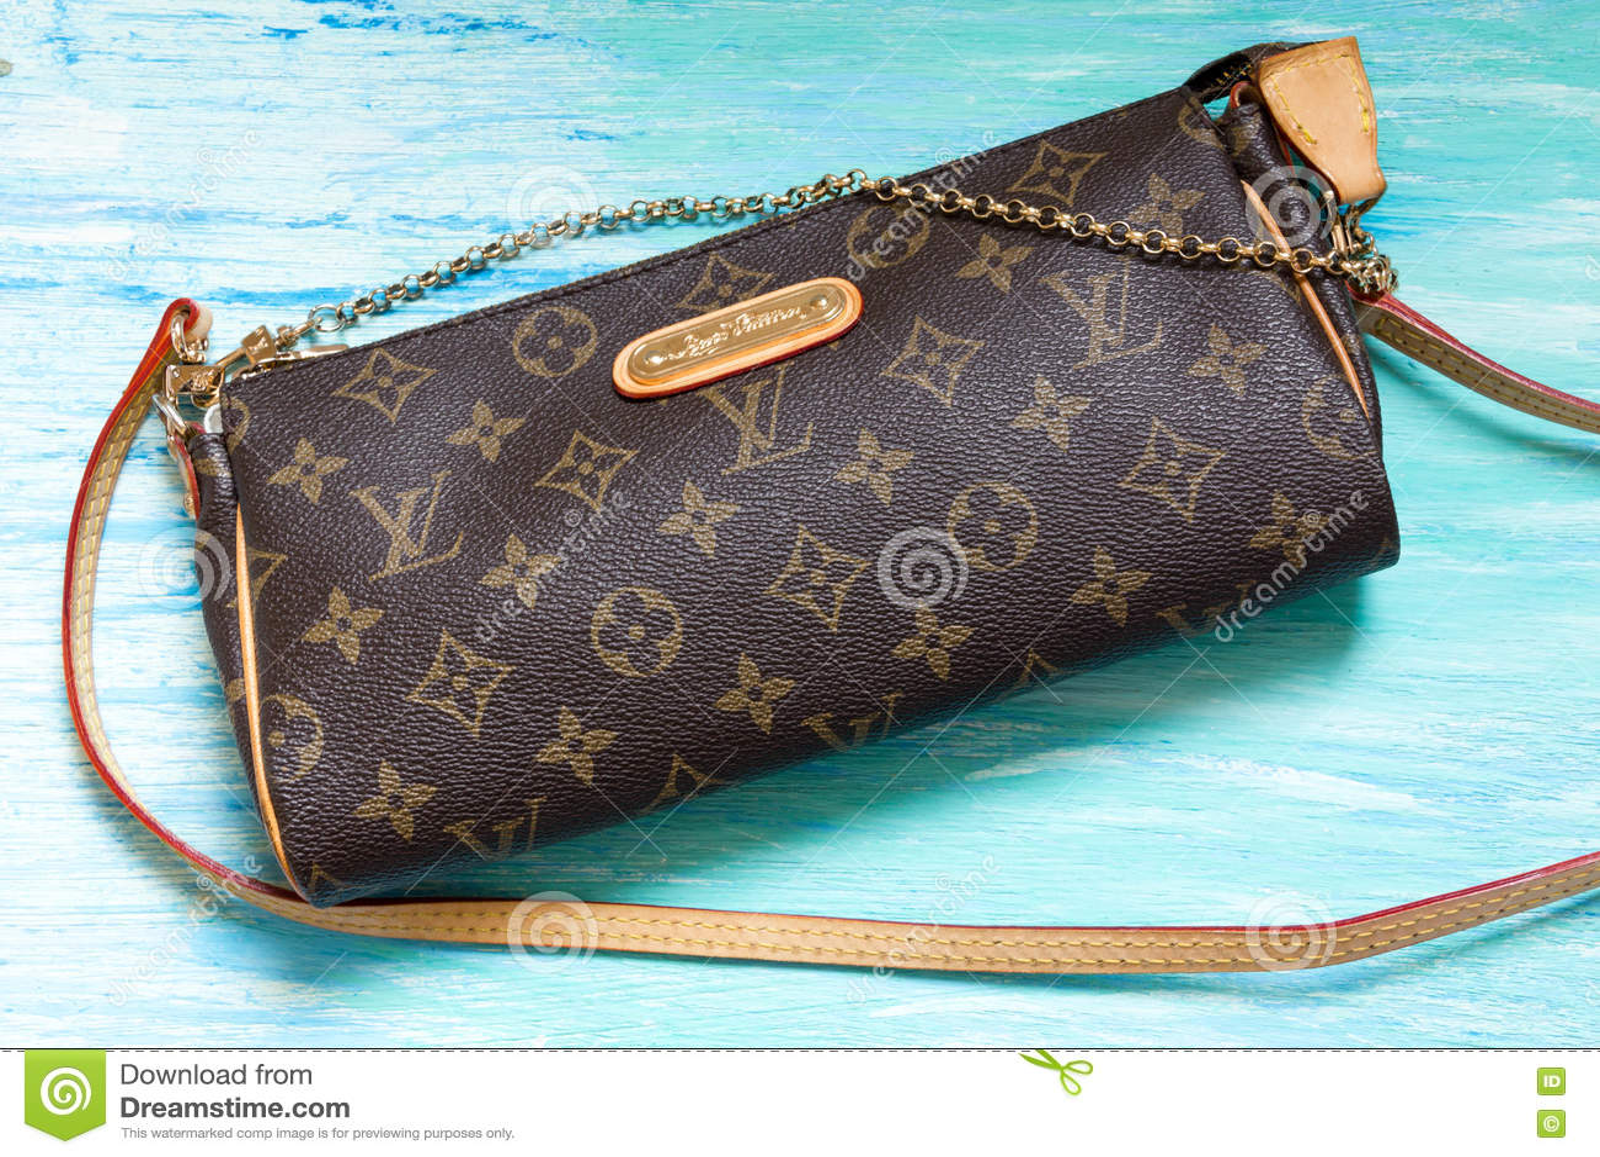 c7508b2449 Fake handbag Louis Vuitton editorial photography. Image of designer ...